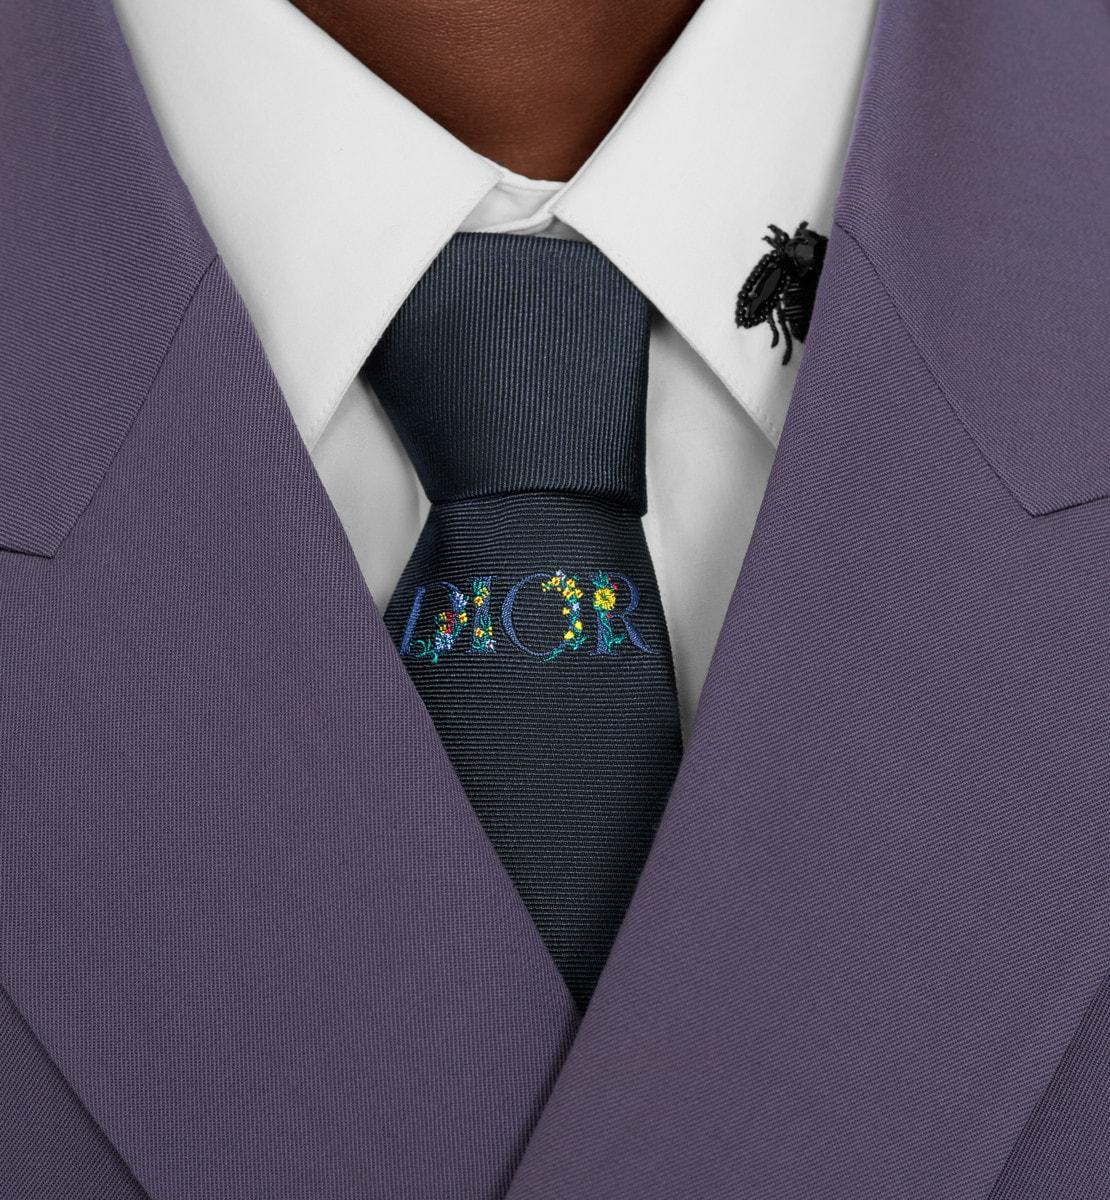 Dior Fleurs Tie